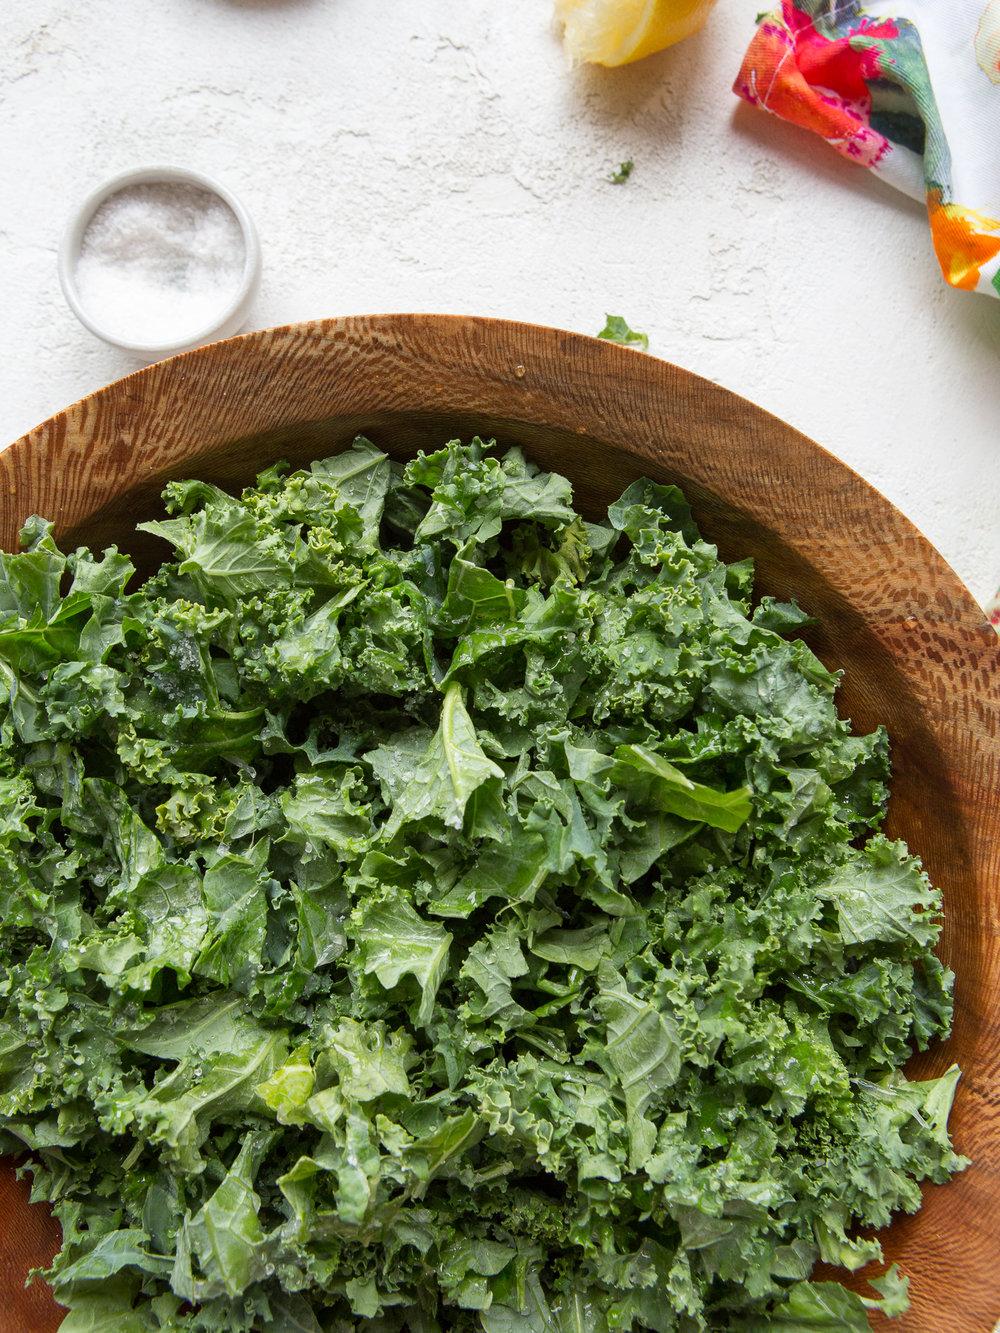 Raw kale before adding lemon juice to tenderize the kale. Photo by  Mackenzie Smith Kelley